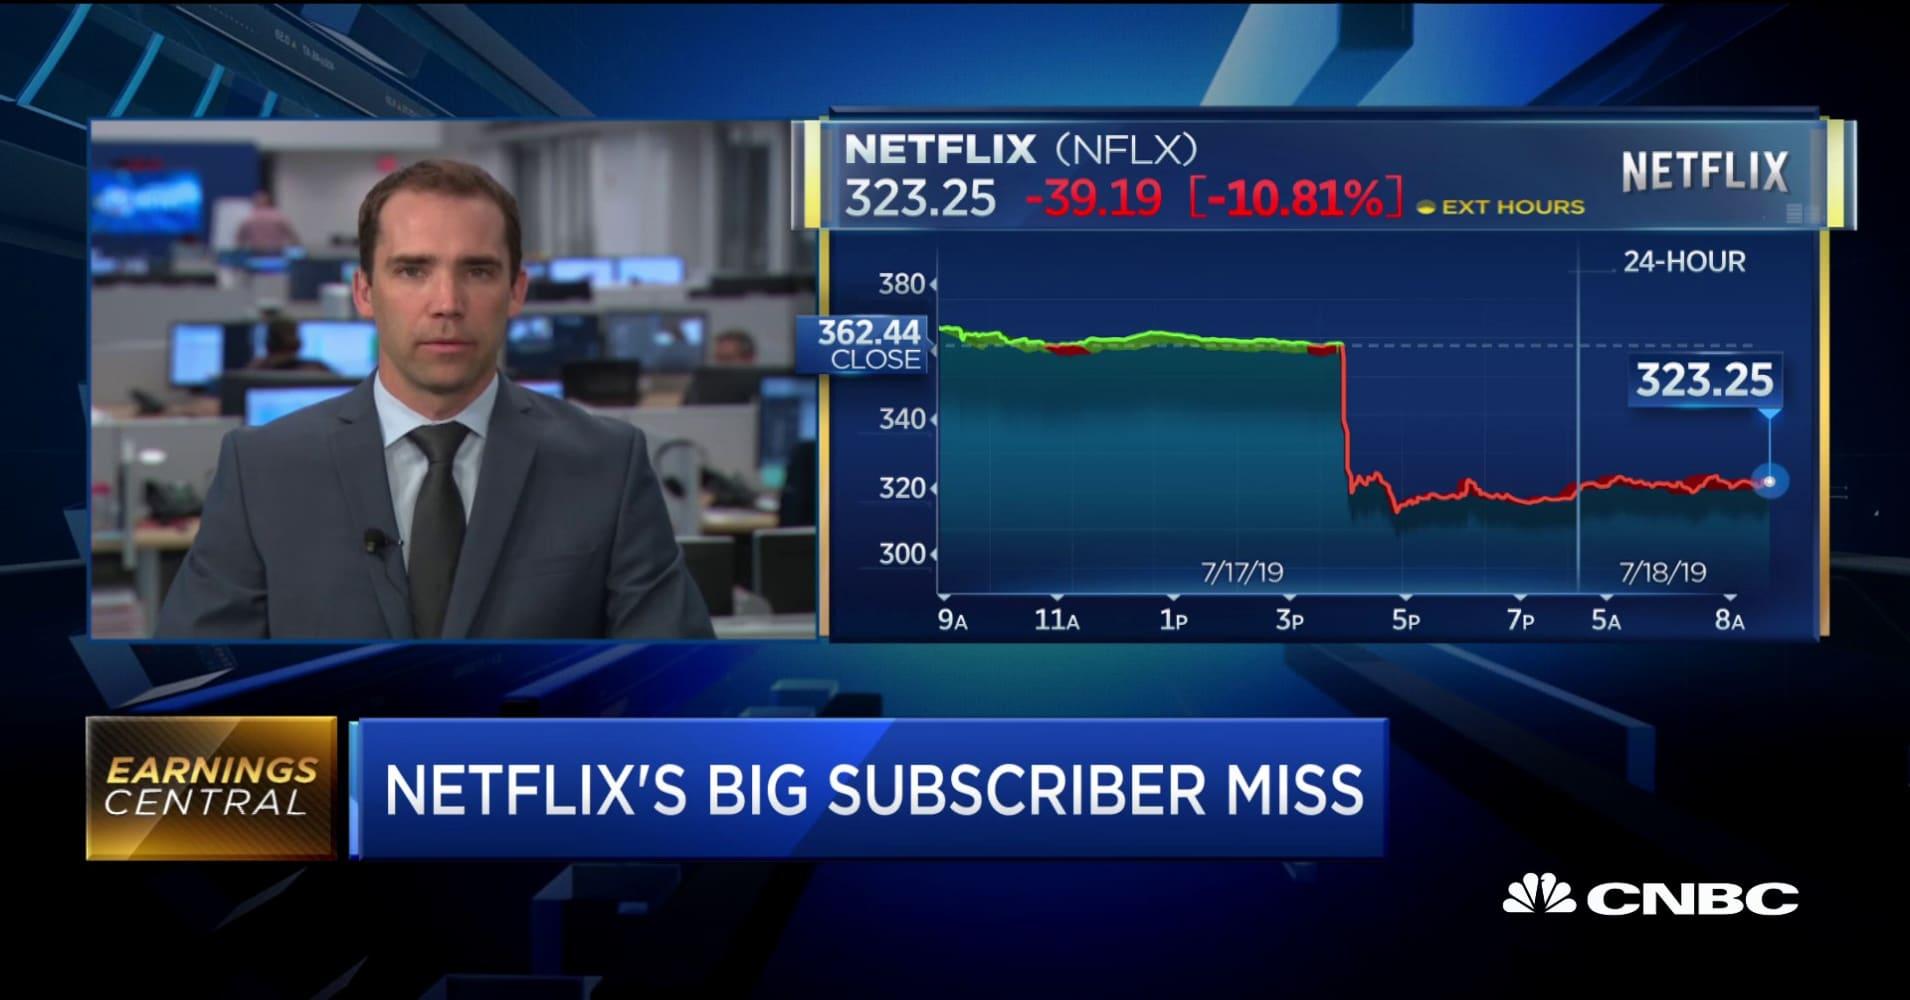 Netflix's third quarter shows signs of improvement, says analyst